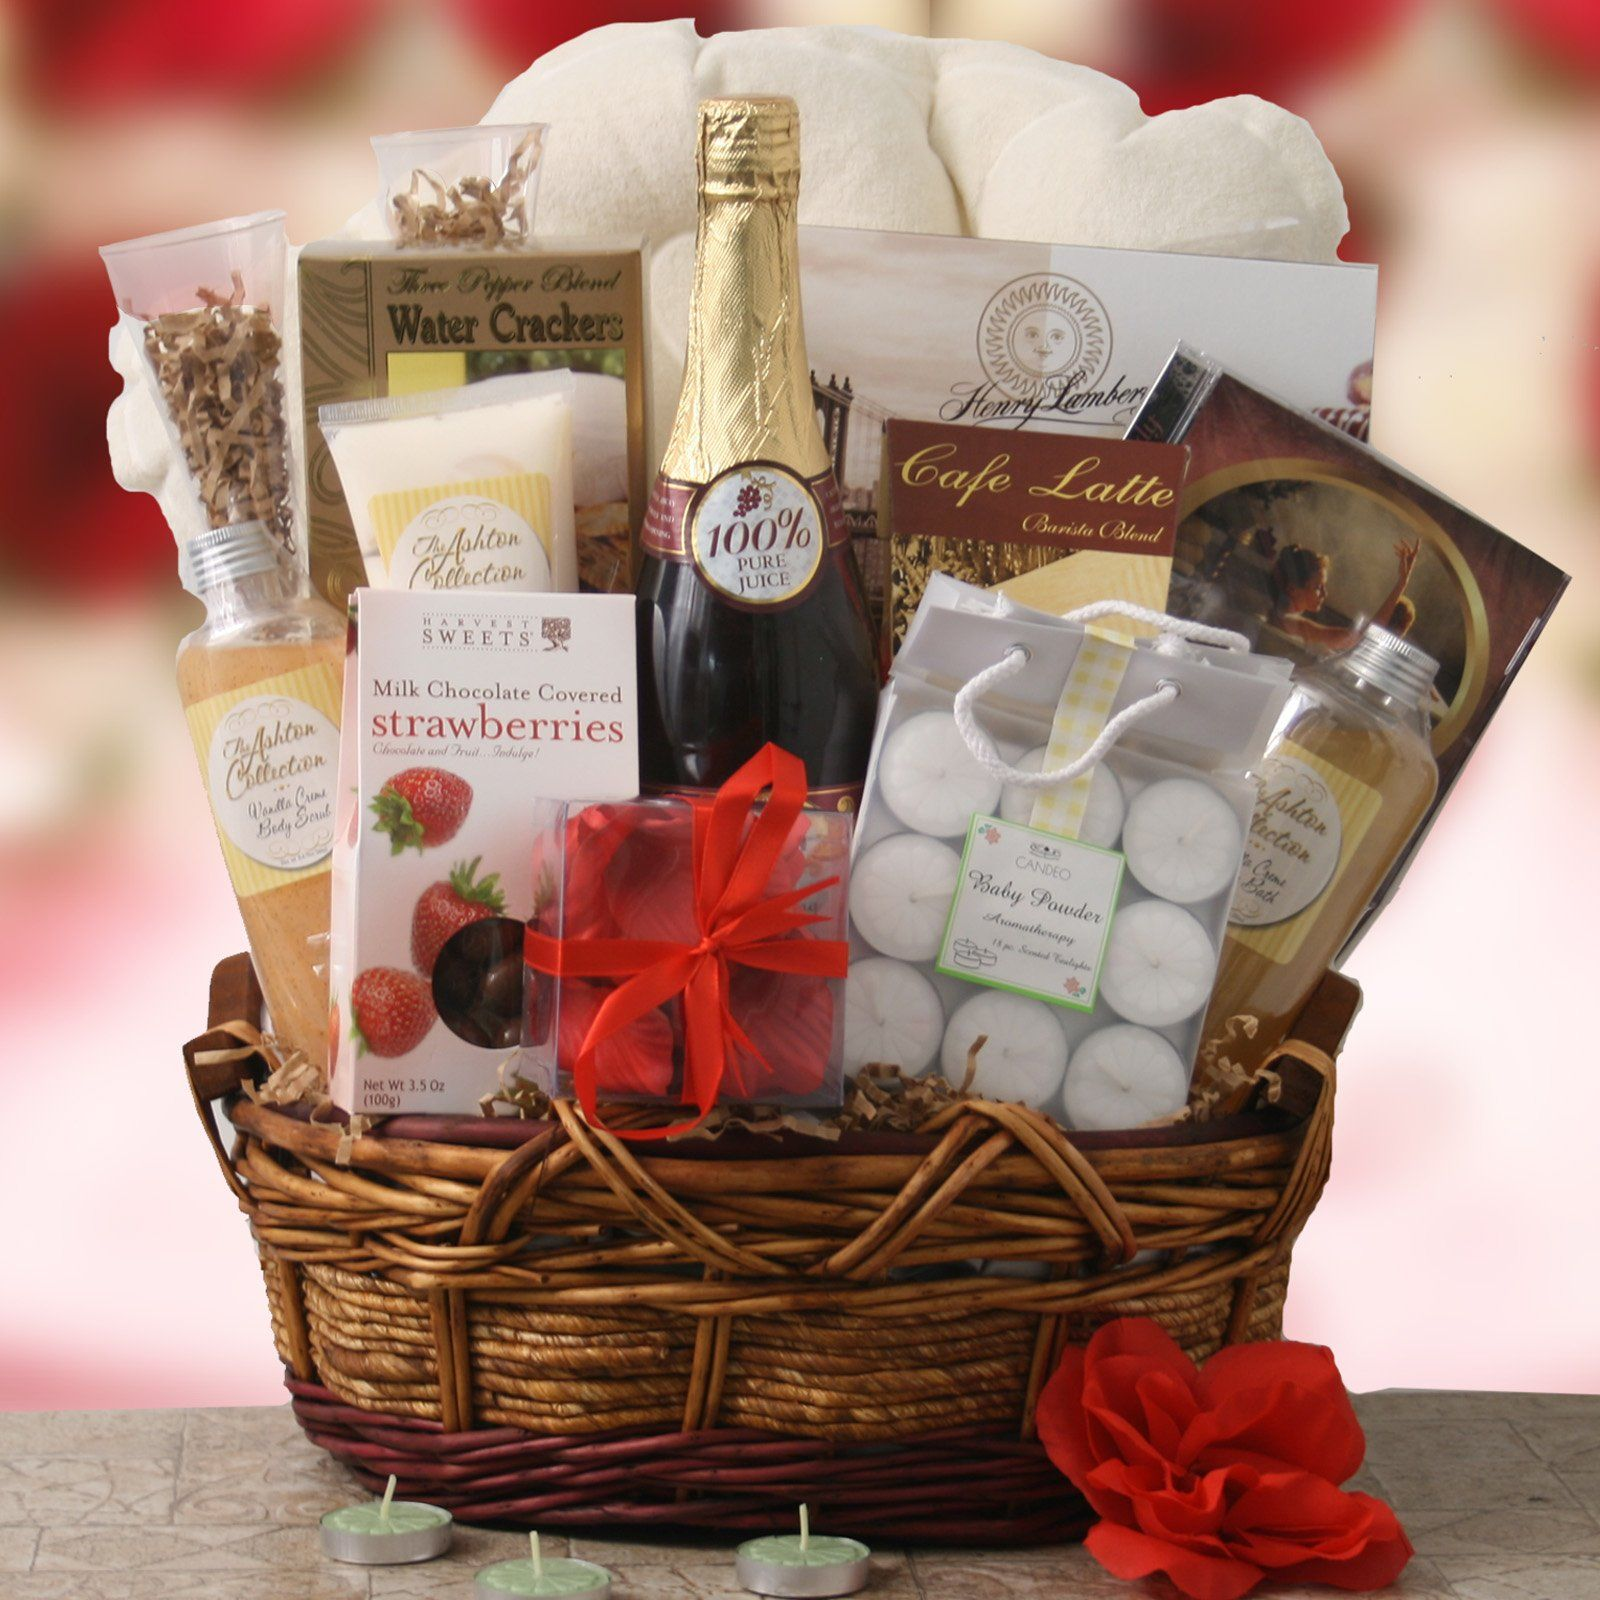 Everlasting Love Gift Basket Www Giftbaskets Com Wedding Gift Baskets Honeymoon Gift Baskets Honeymoon Gifts